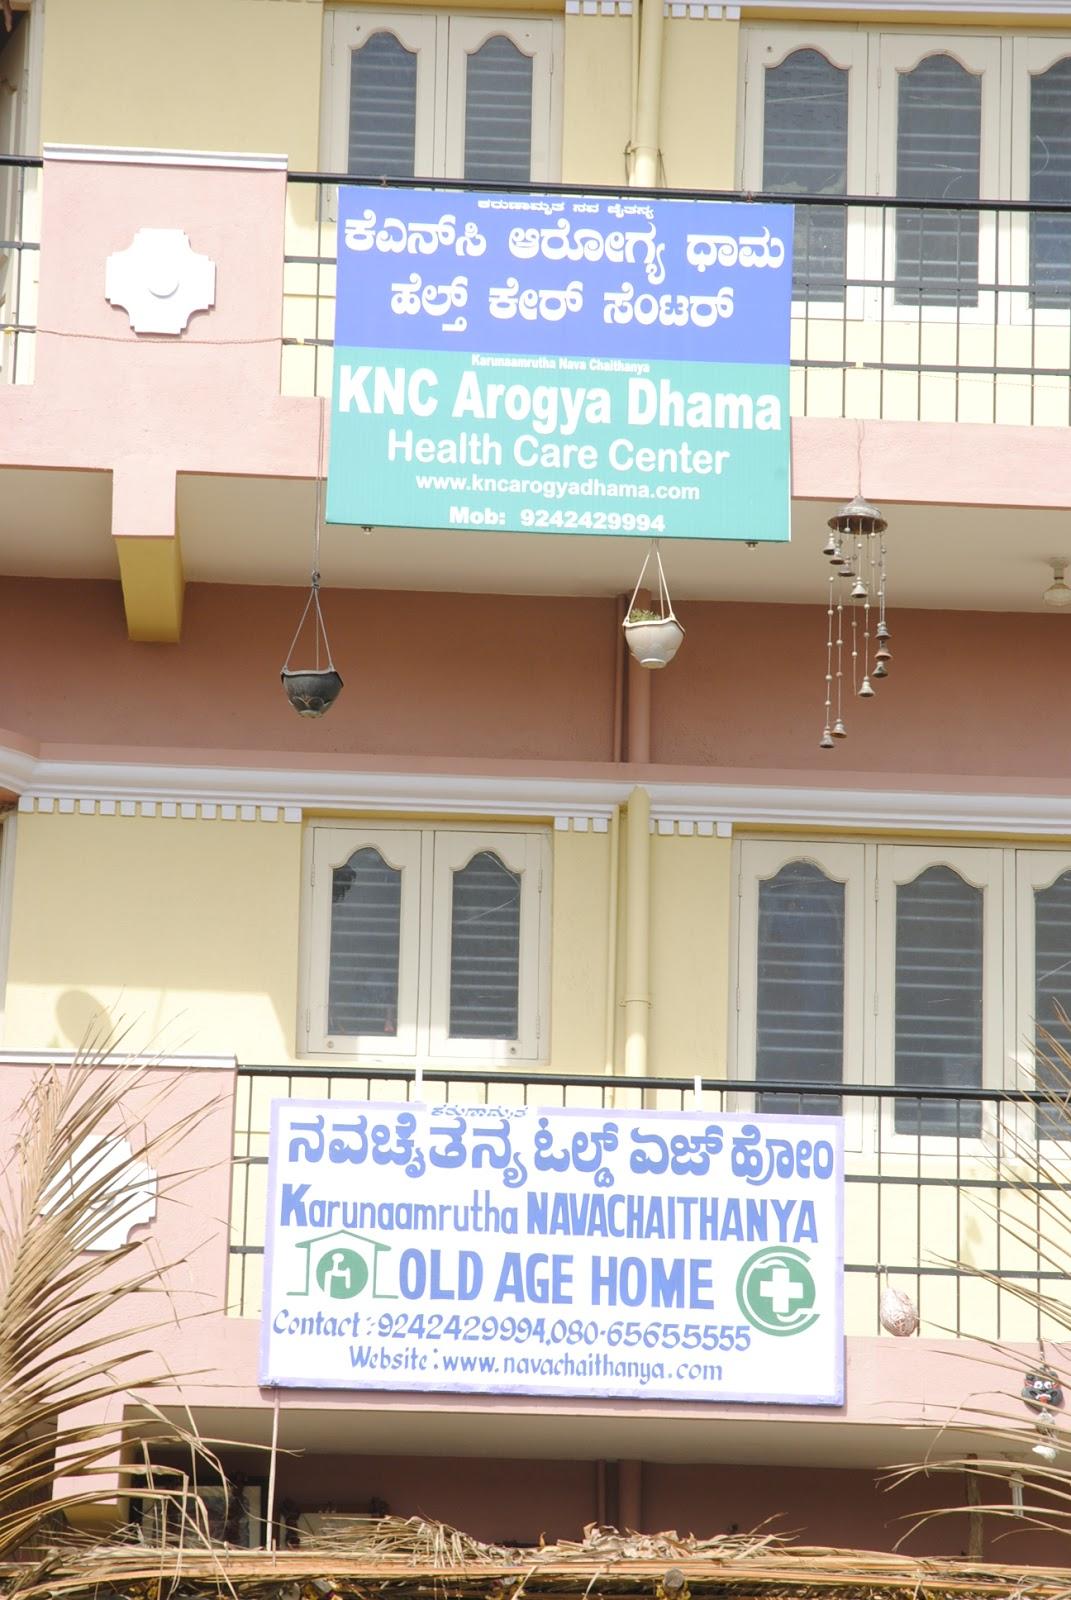 Age Home: Muslim Old Age Homes In Bangalore, Kncarogyadham 9242429994